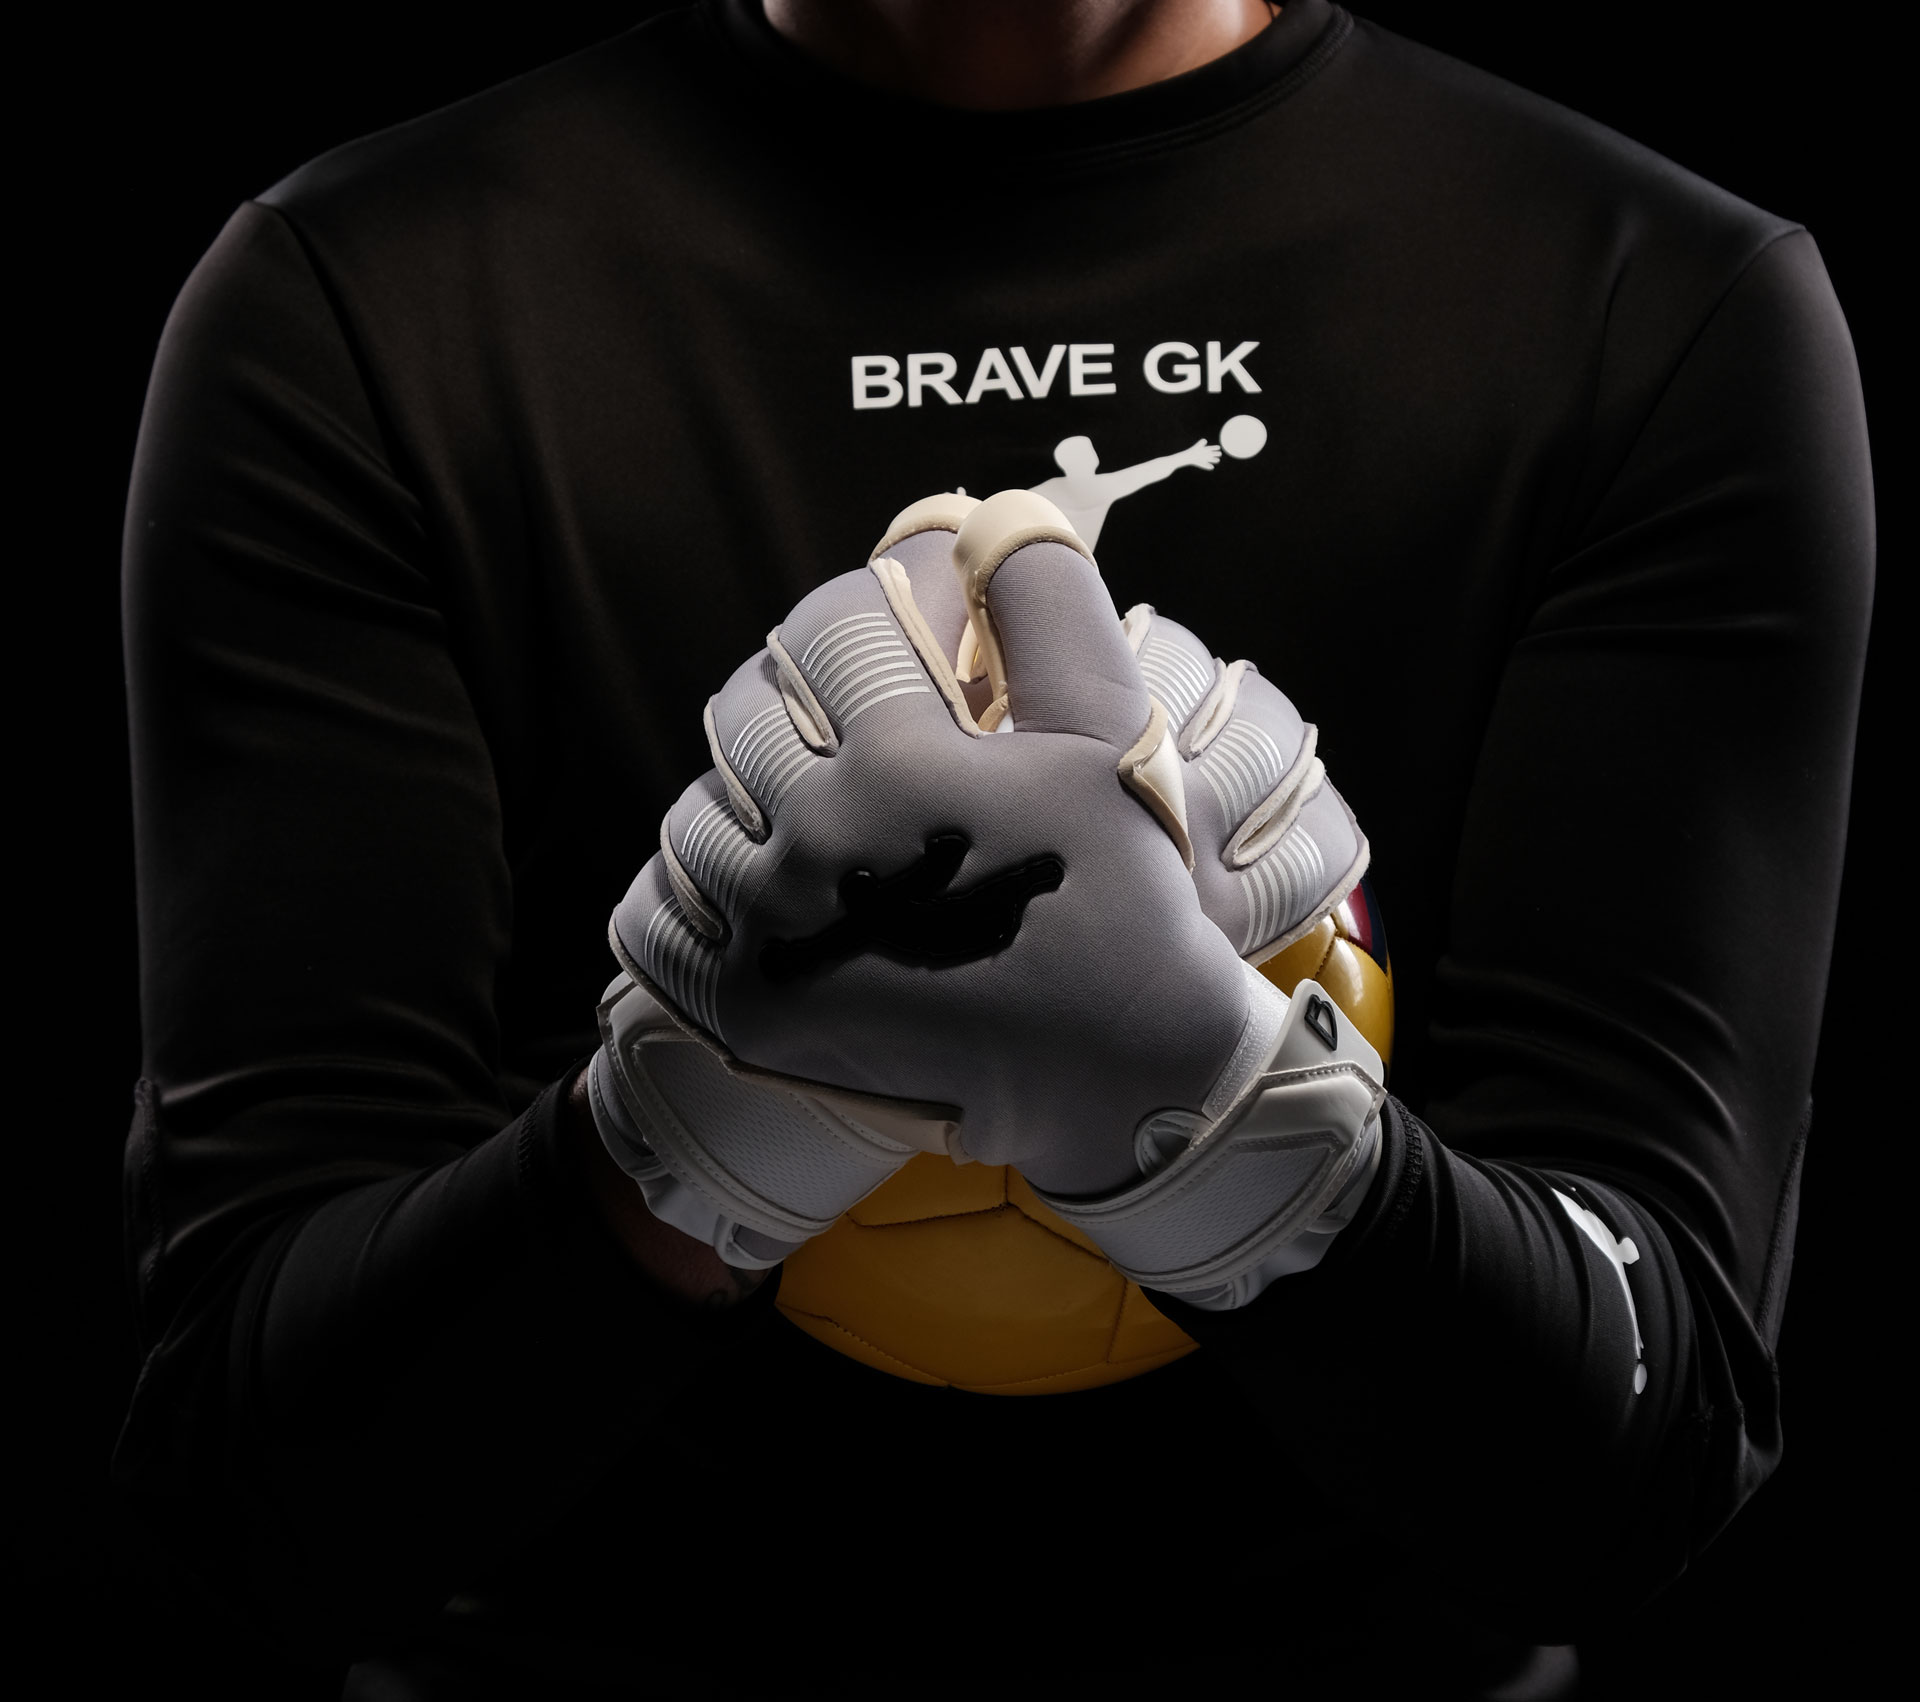 Вратарское термобелье Brave GK-официальный интернет-магазин Brave GK